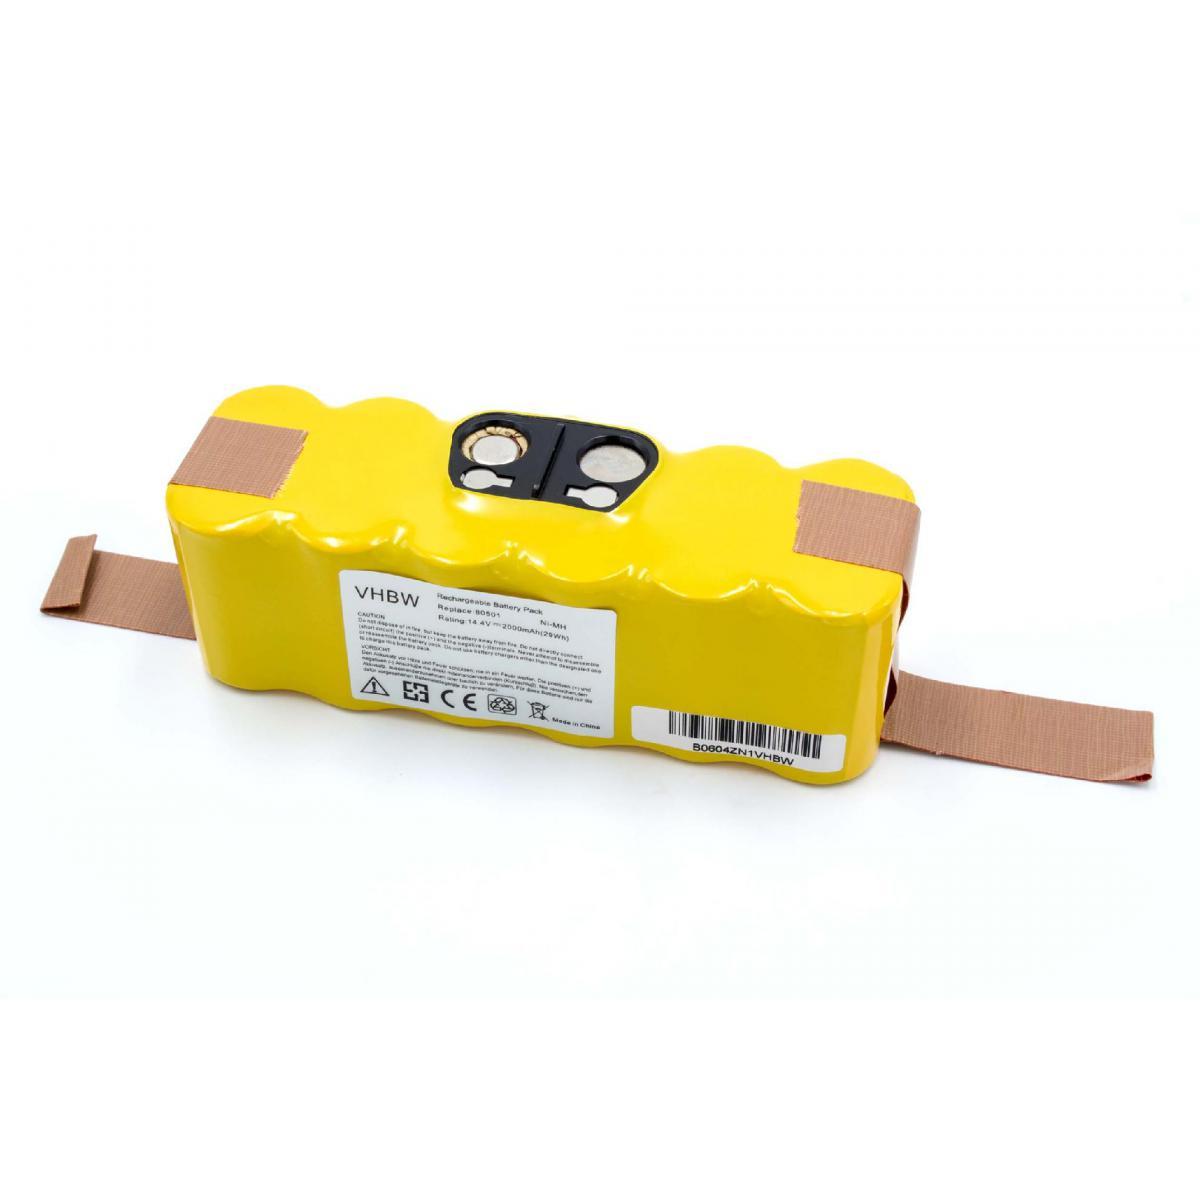 Vhbw vhbw NiMH Batterie 2000mAh compatible avec iRobot Roomba 581, 582, 583, 590, 605, 610, 615, 616, 620, 621, 625, 630 remp